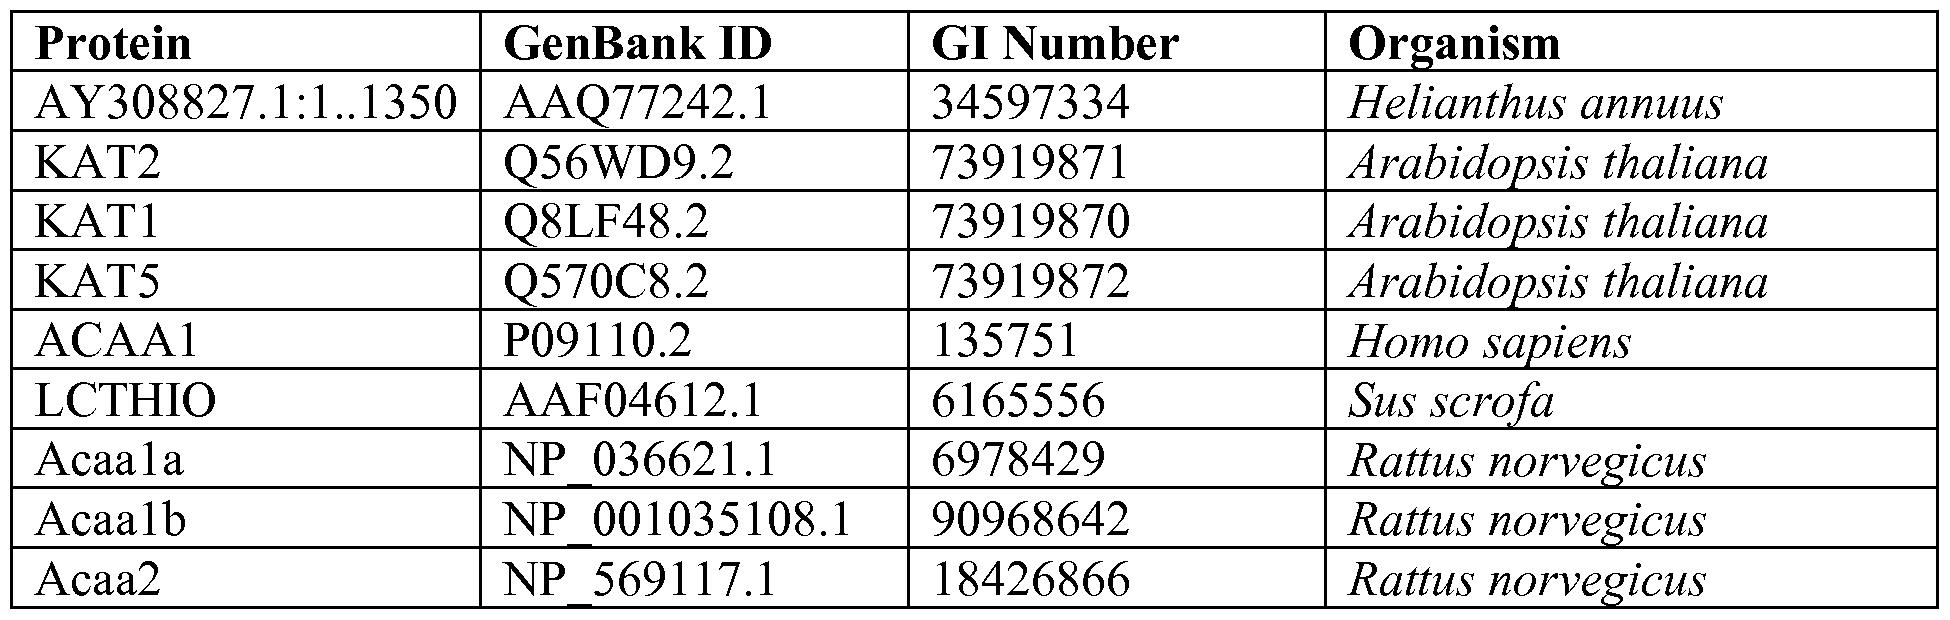 EC 2.3.1.194